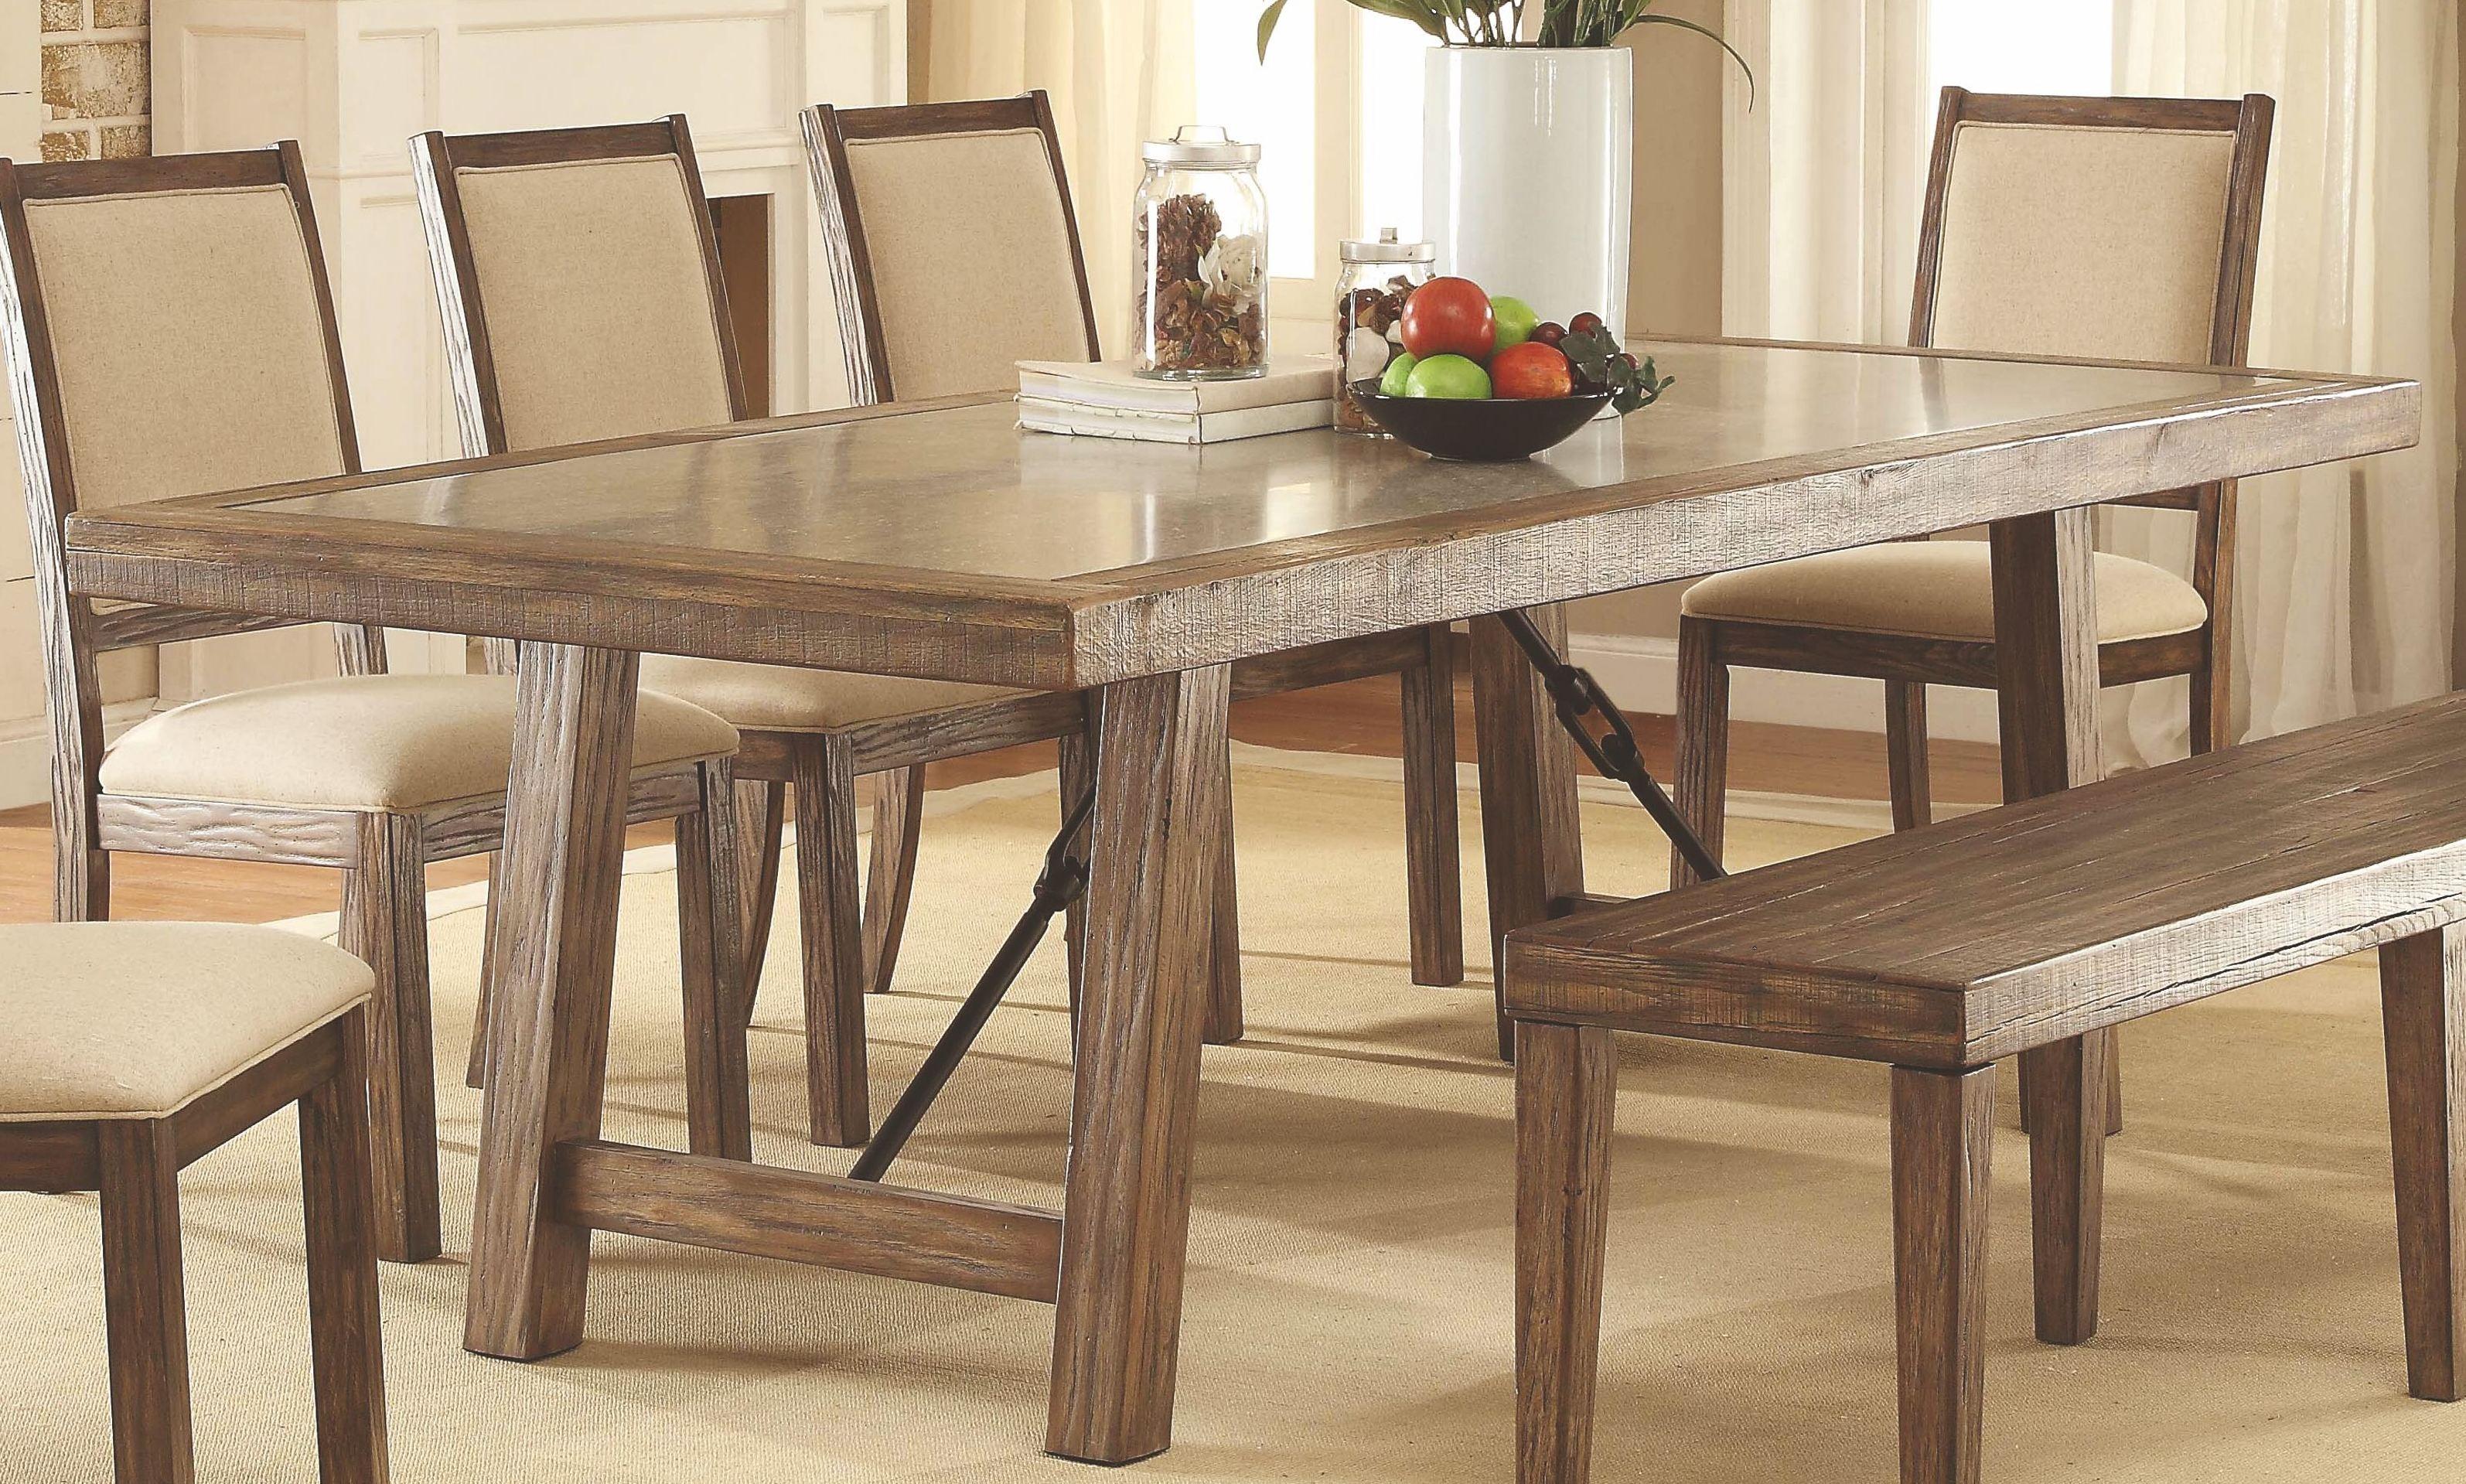 Colettte Rustic Oak Rectangular Dining Room Set, Cm3562t